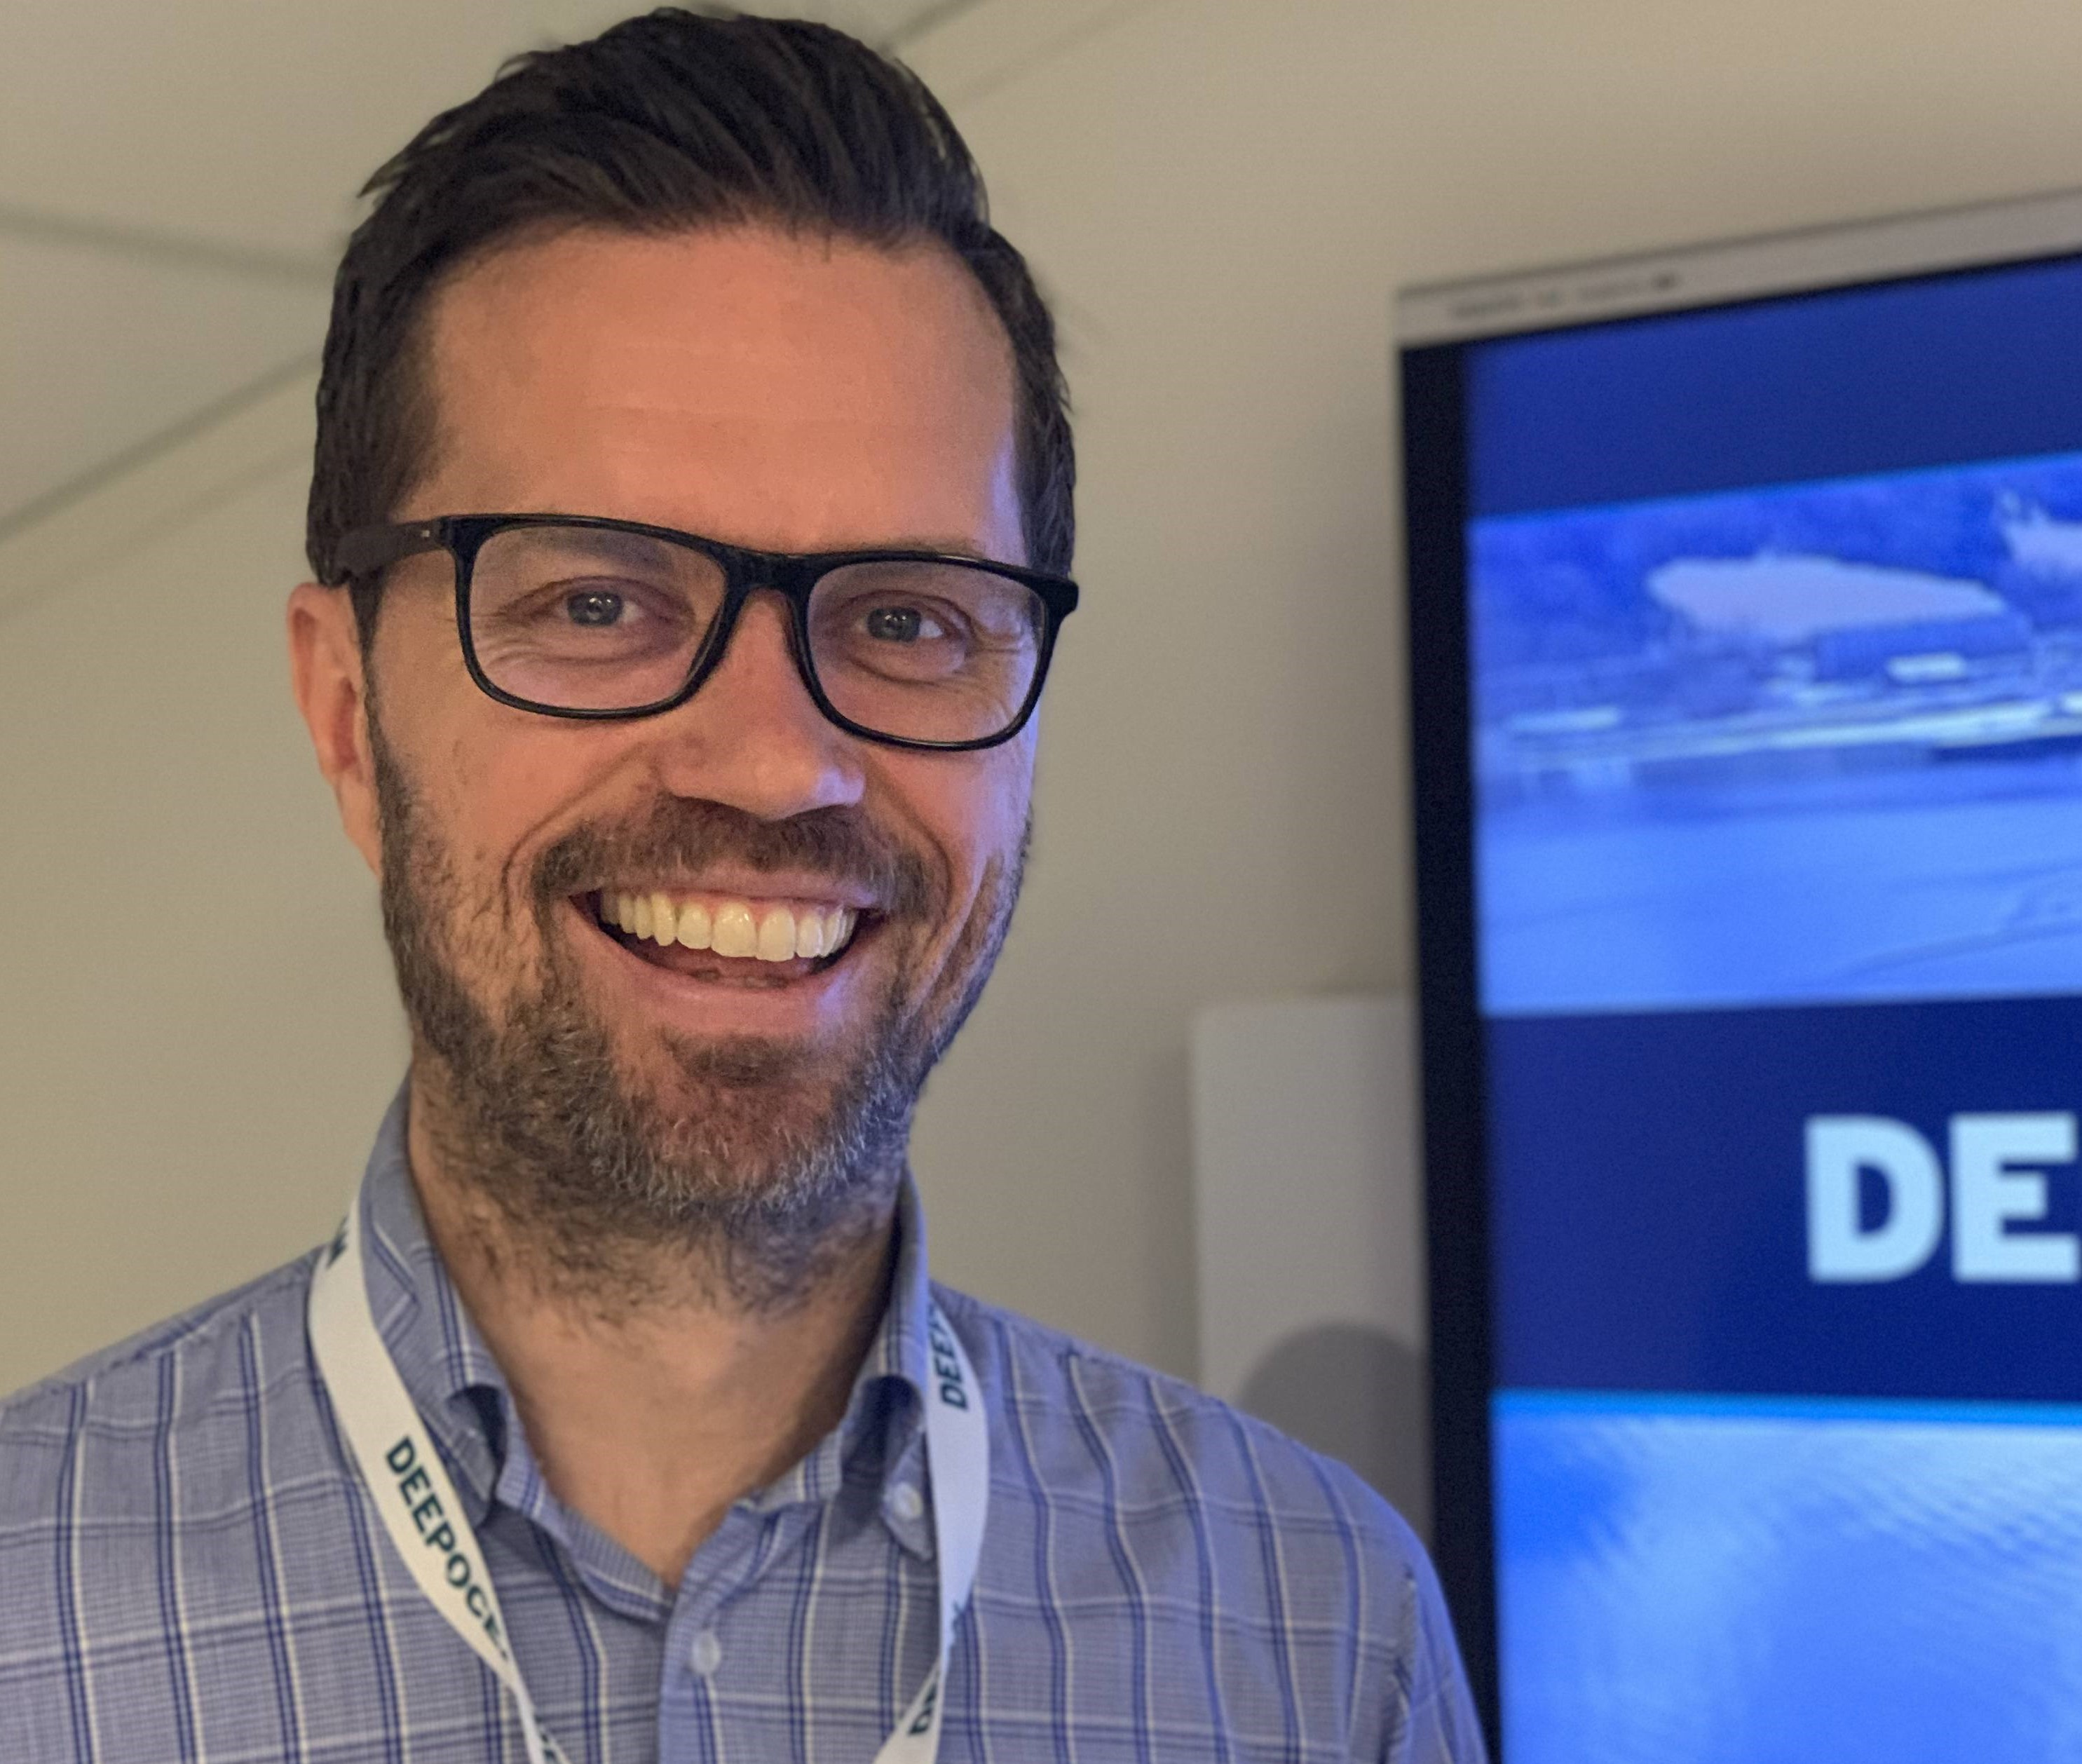 DeepOcean Project Manager, Terje Nordeide